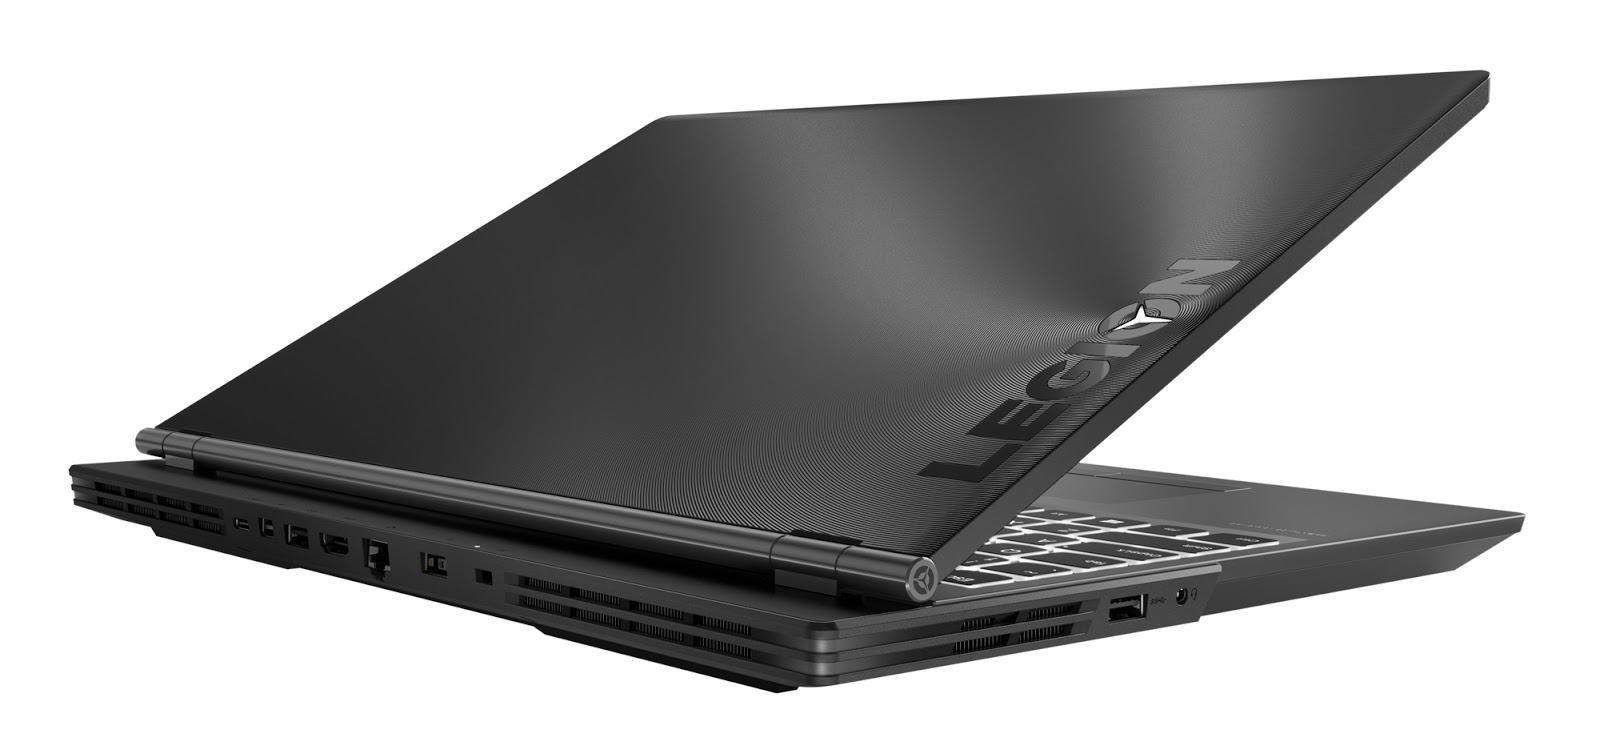 Фото 4. Ноутбук Lenovo Legion Y540-15IRH Black (81SX012HRE)